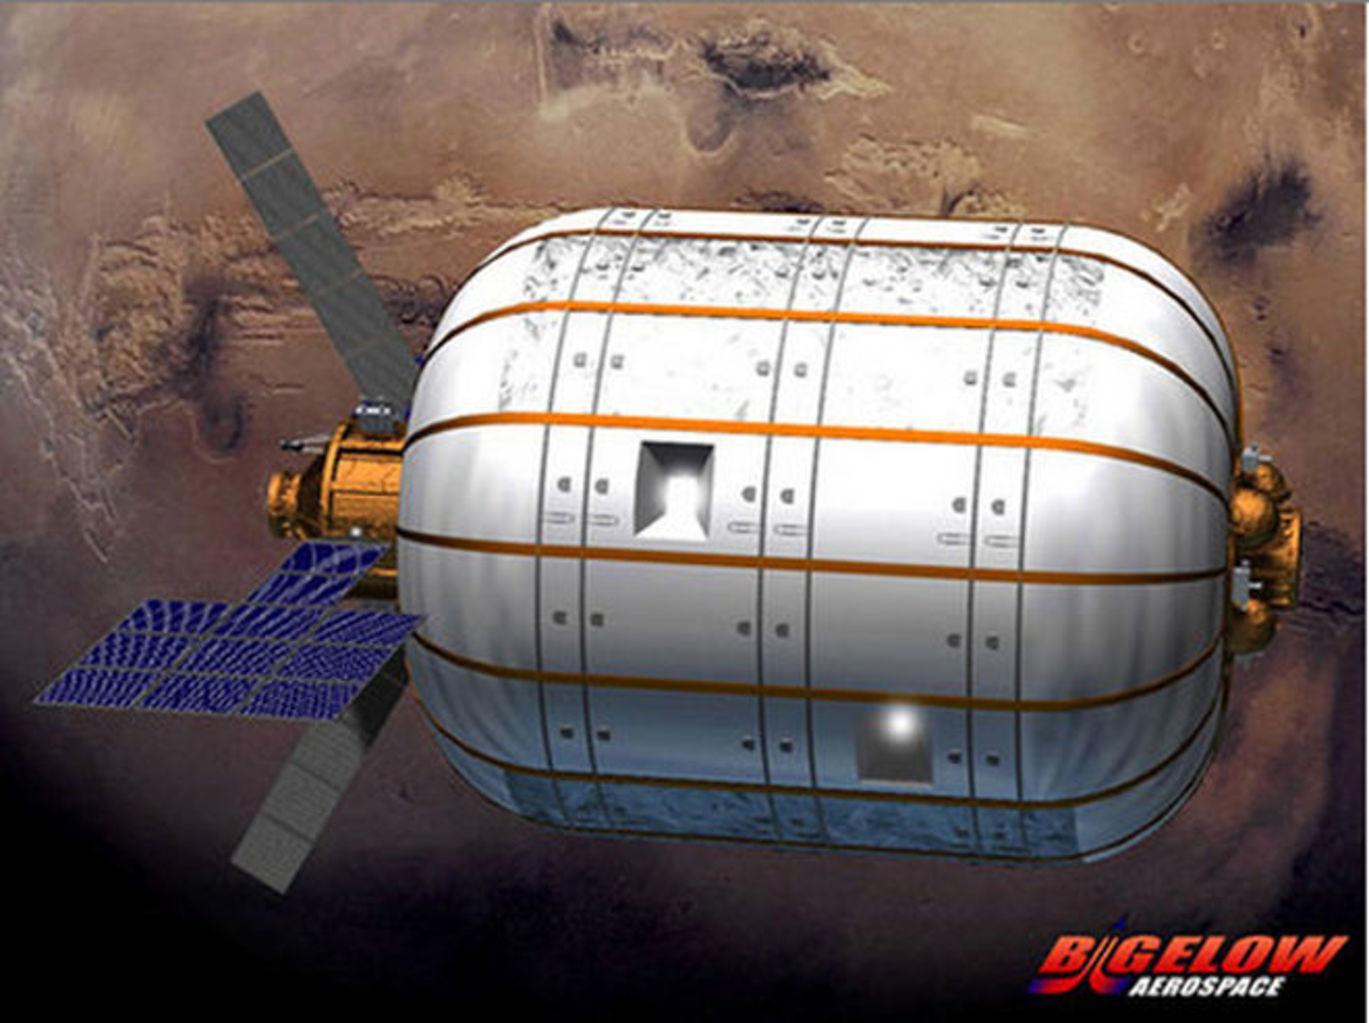 inflatable spacecraft habitat - photo #6